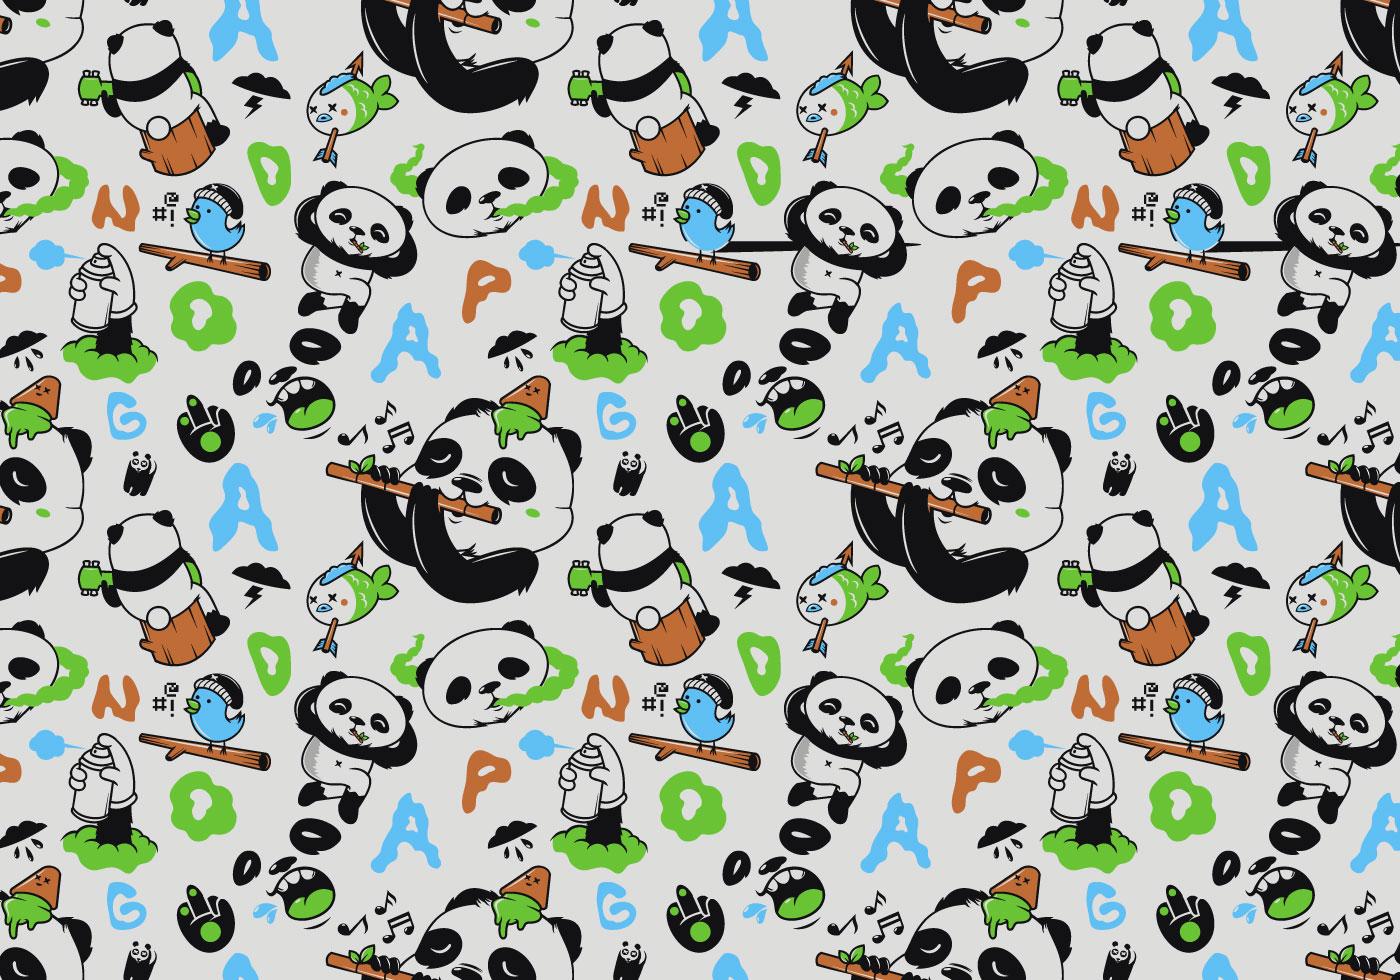 Vector Seamless Panda Pattern - Download Free Vector Art ...